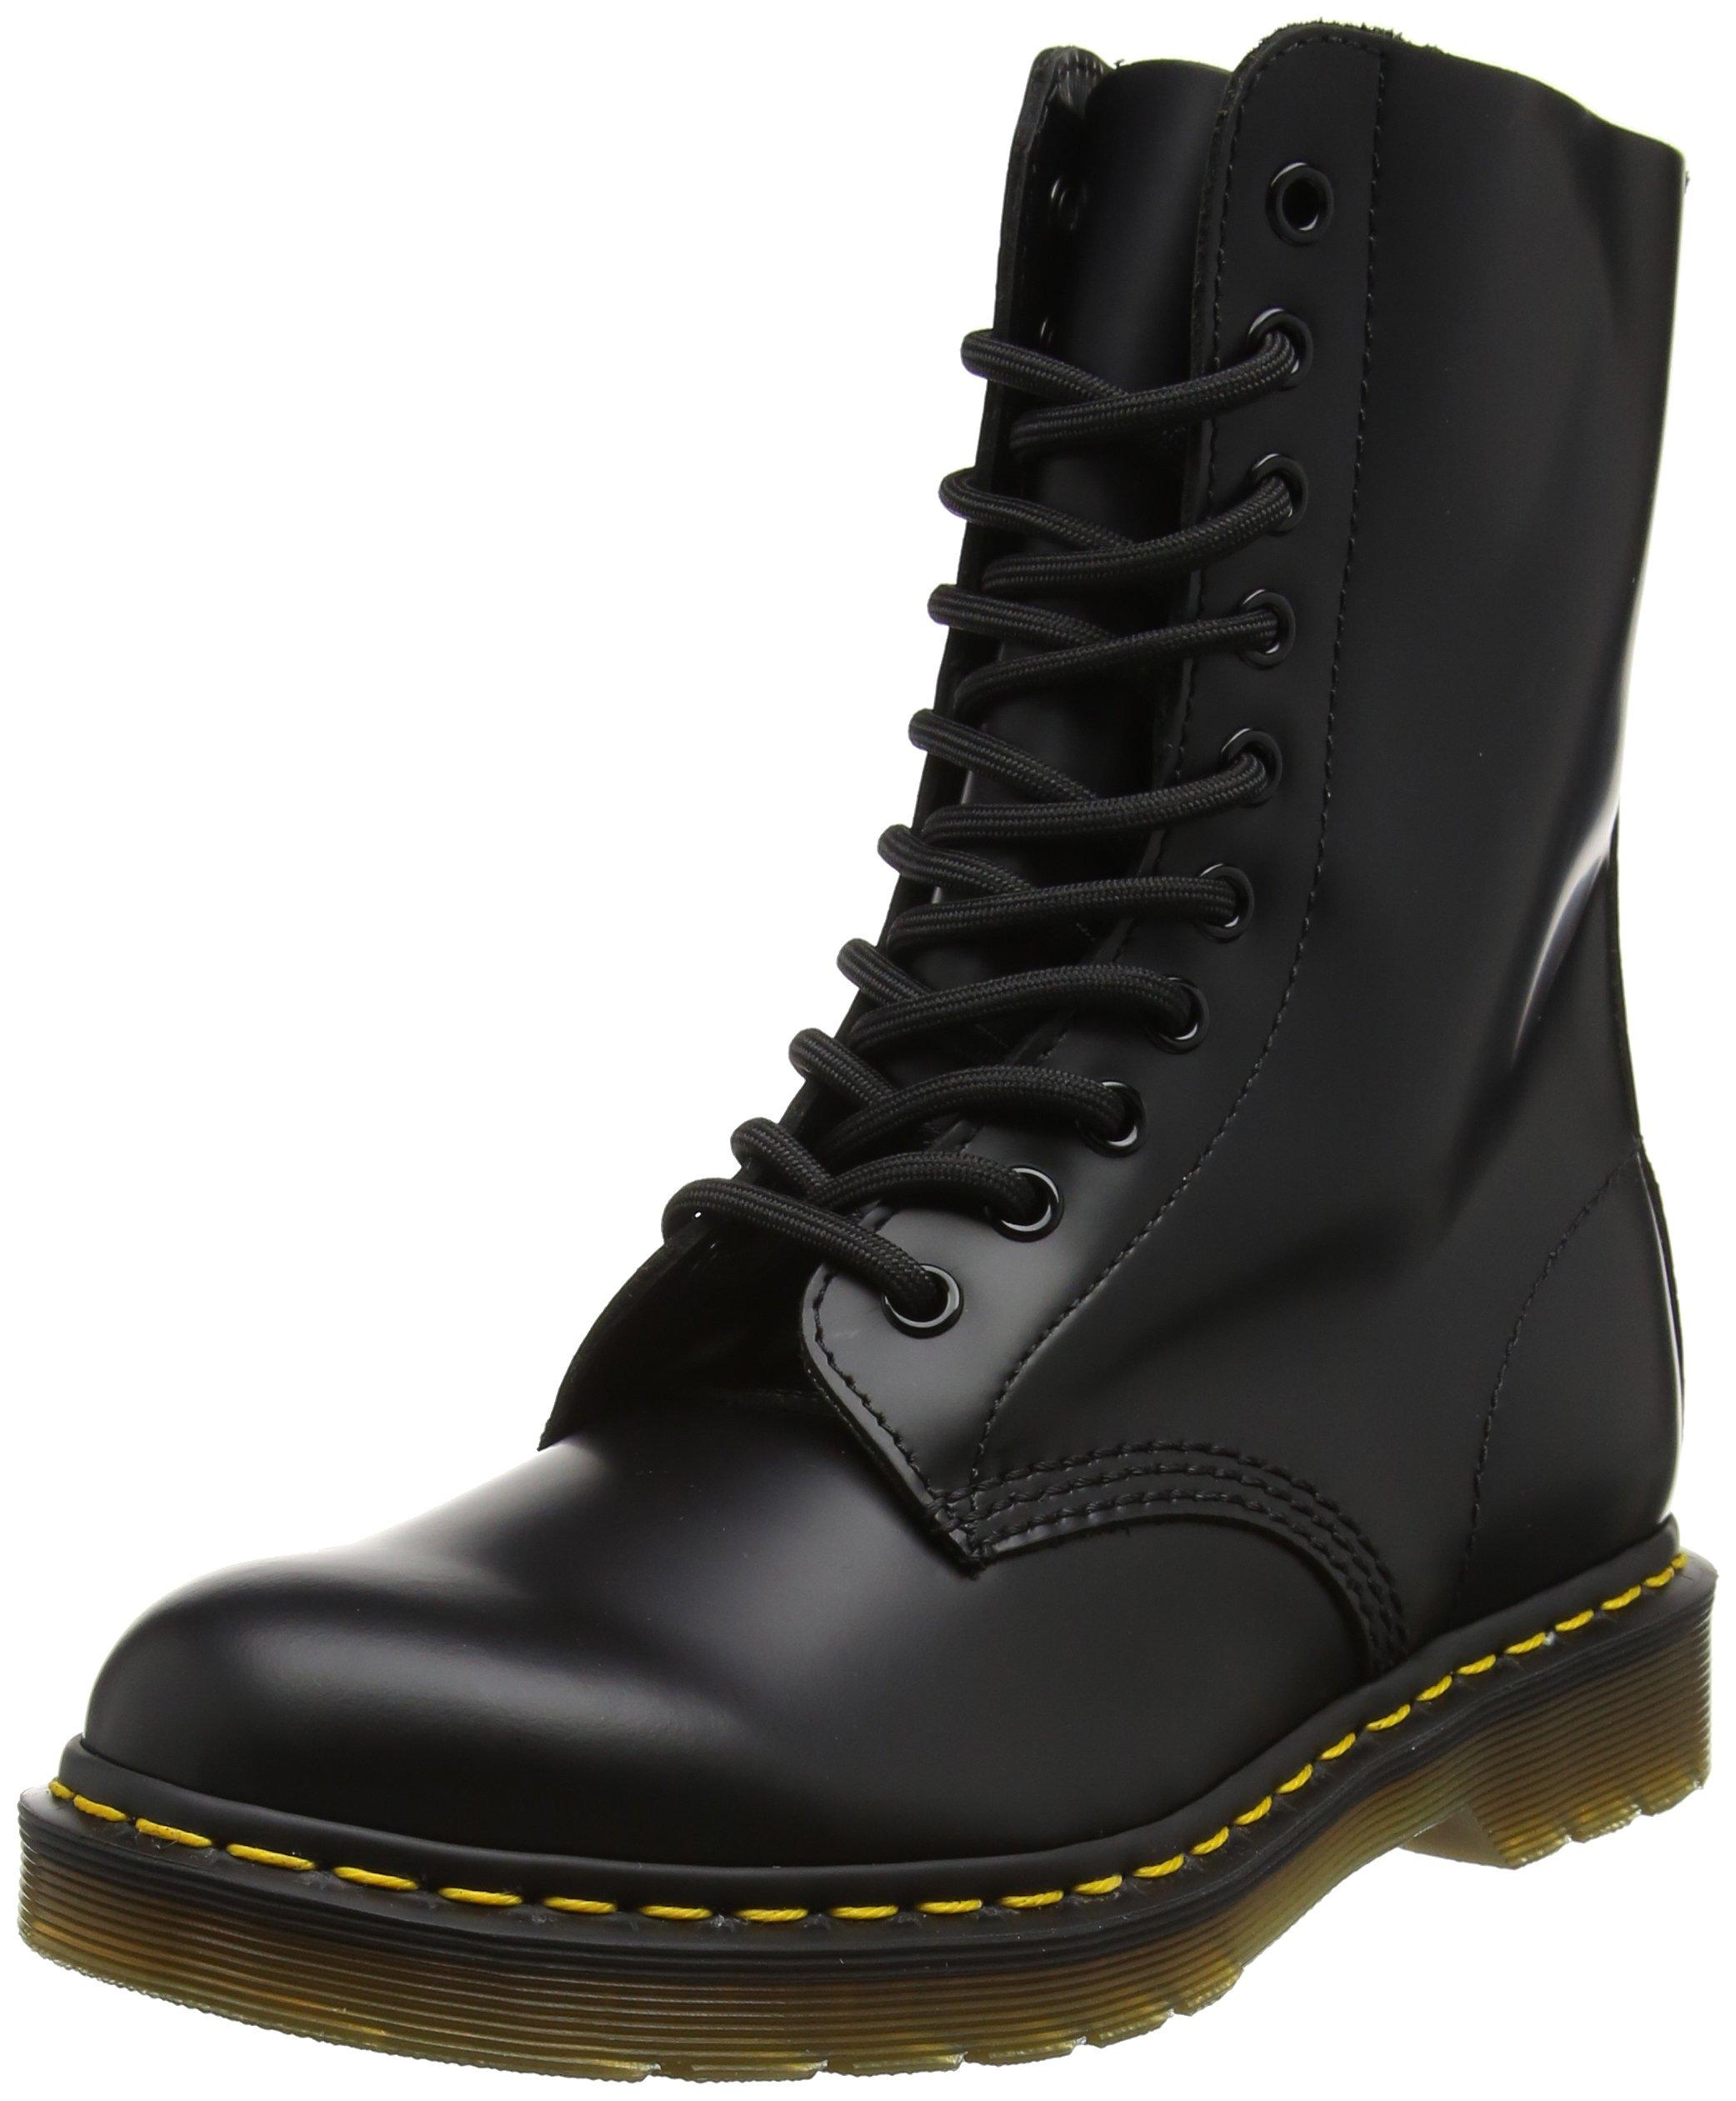 Dr. Martens Original 10 Eye Boot,Black Smooth,7 UK (US Men's 8 M/Women's 9 M)